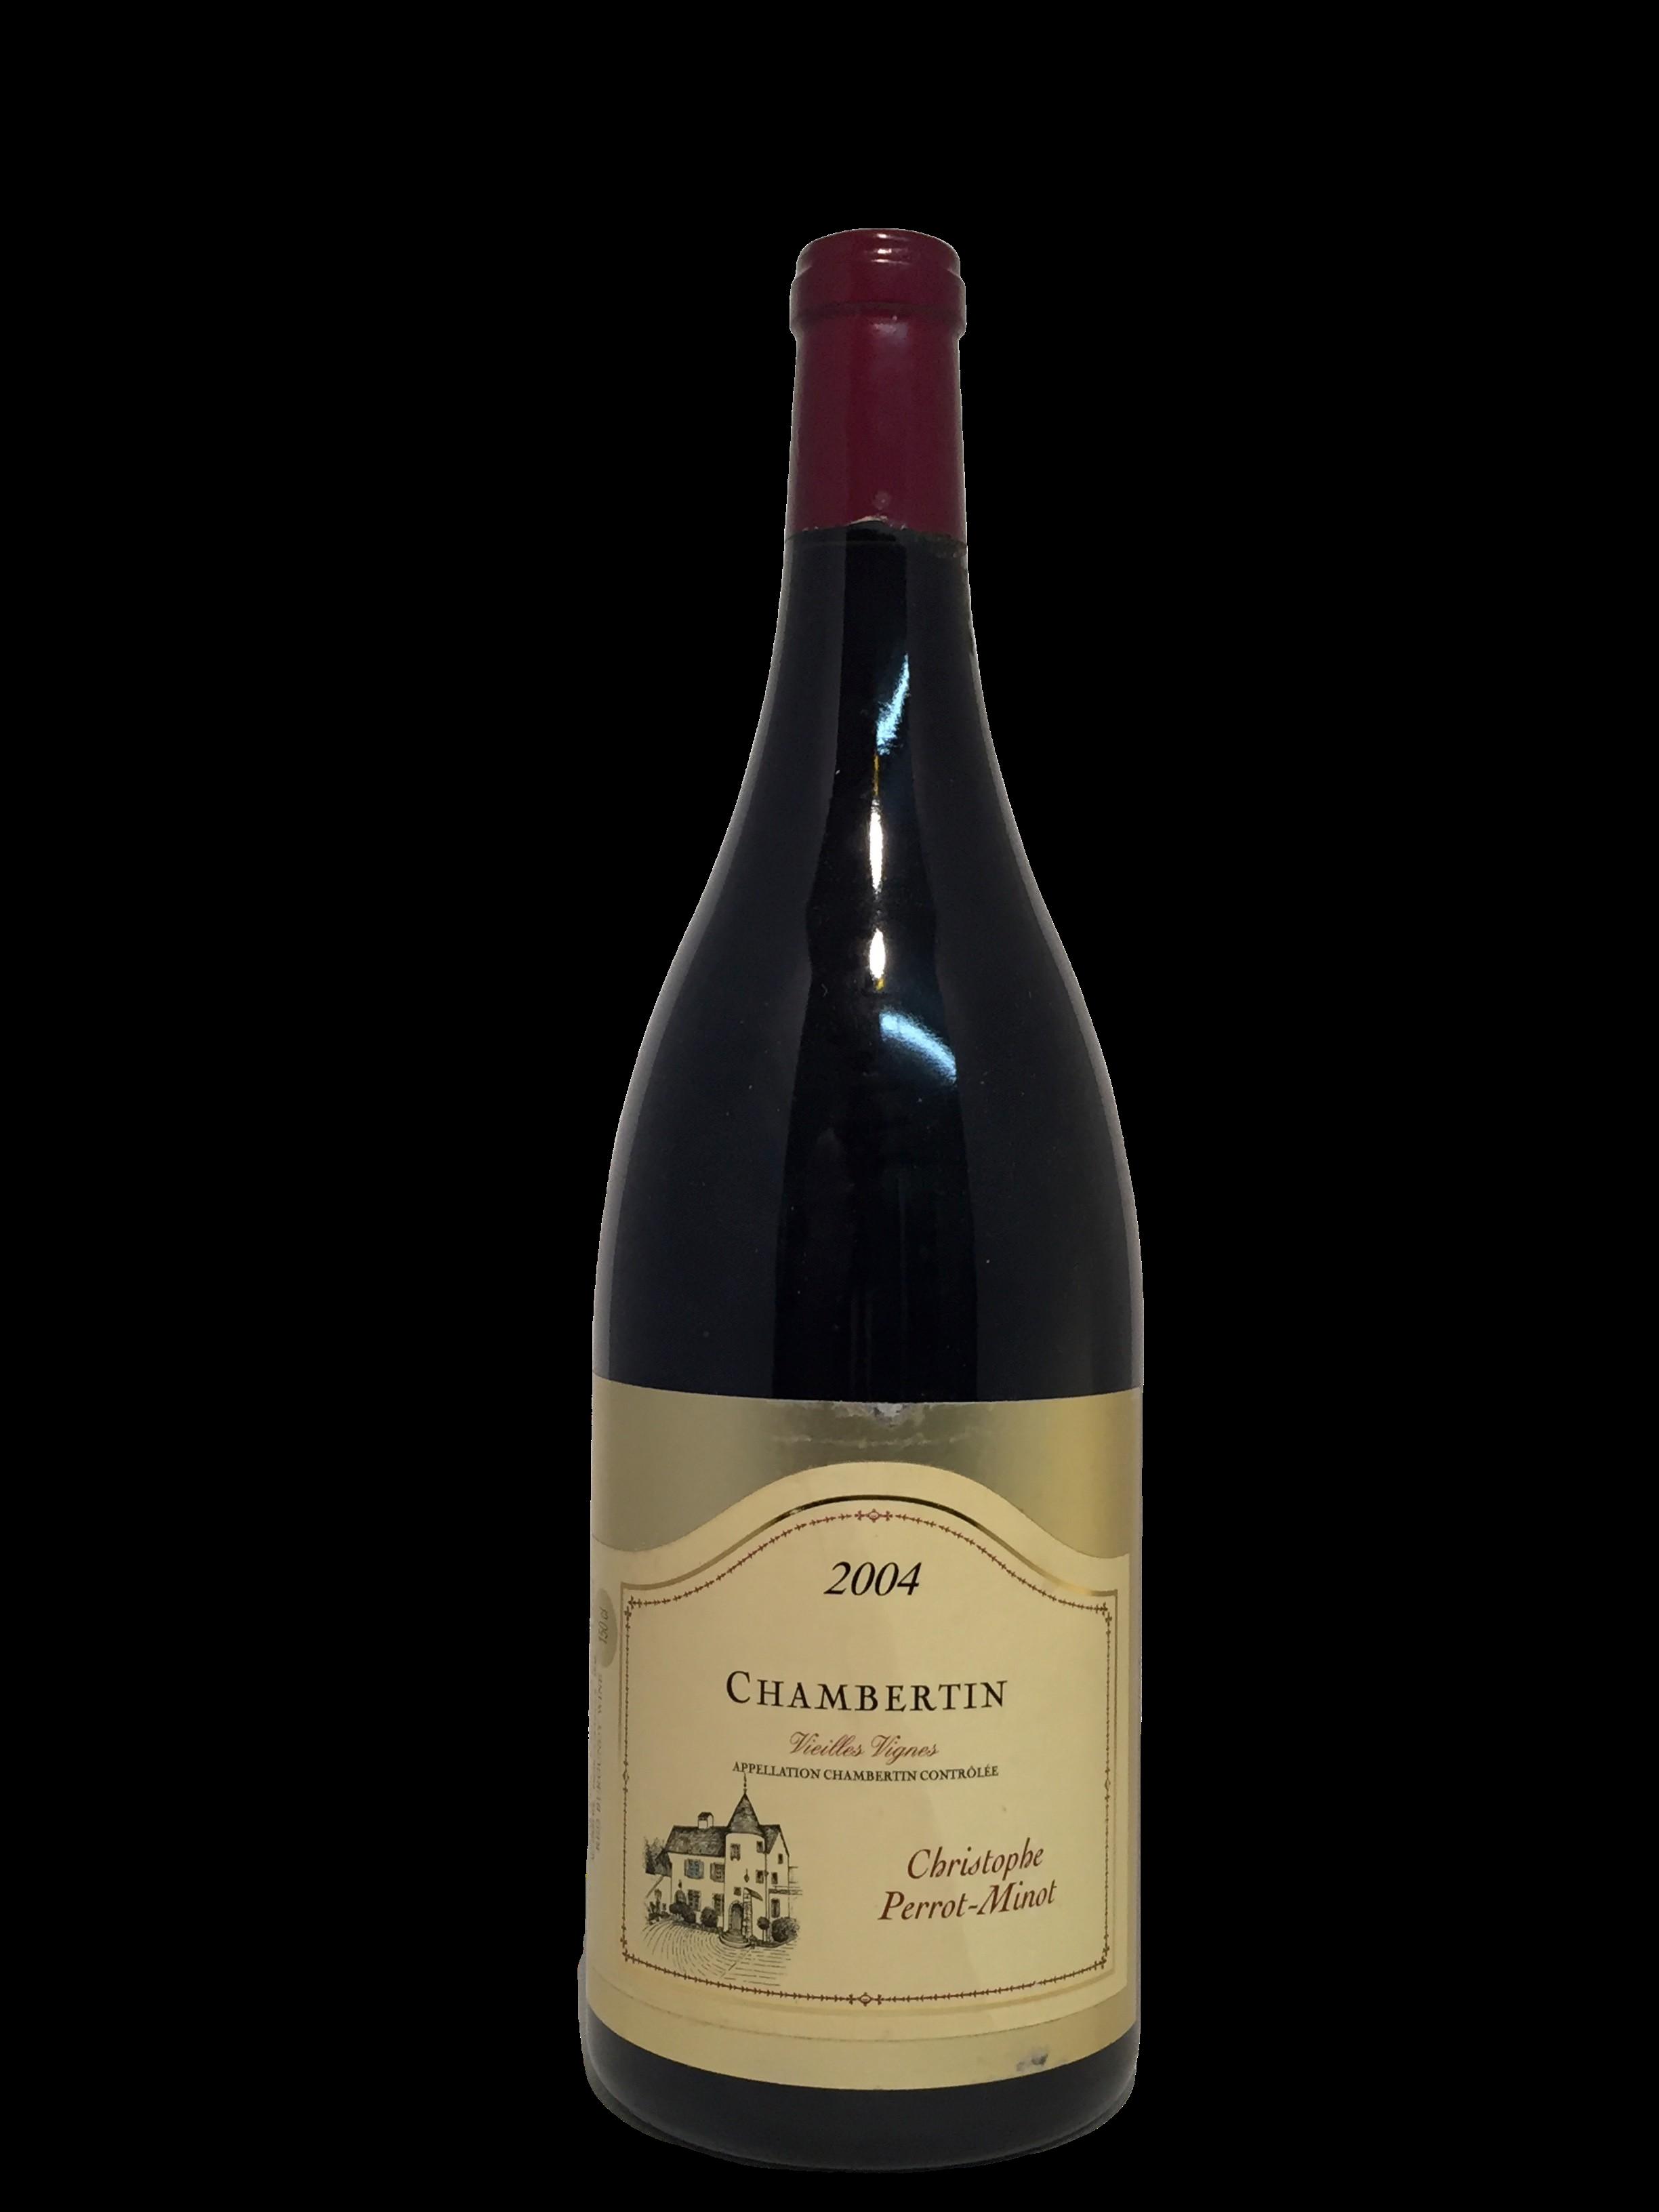 Domaine Perrot-Minot – Chambertin Vieilles Vignes 2004 (Magnum)